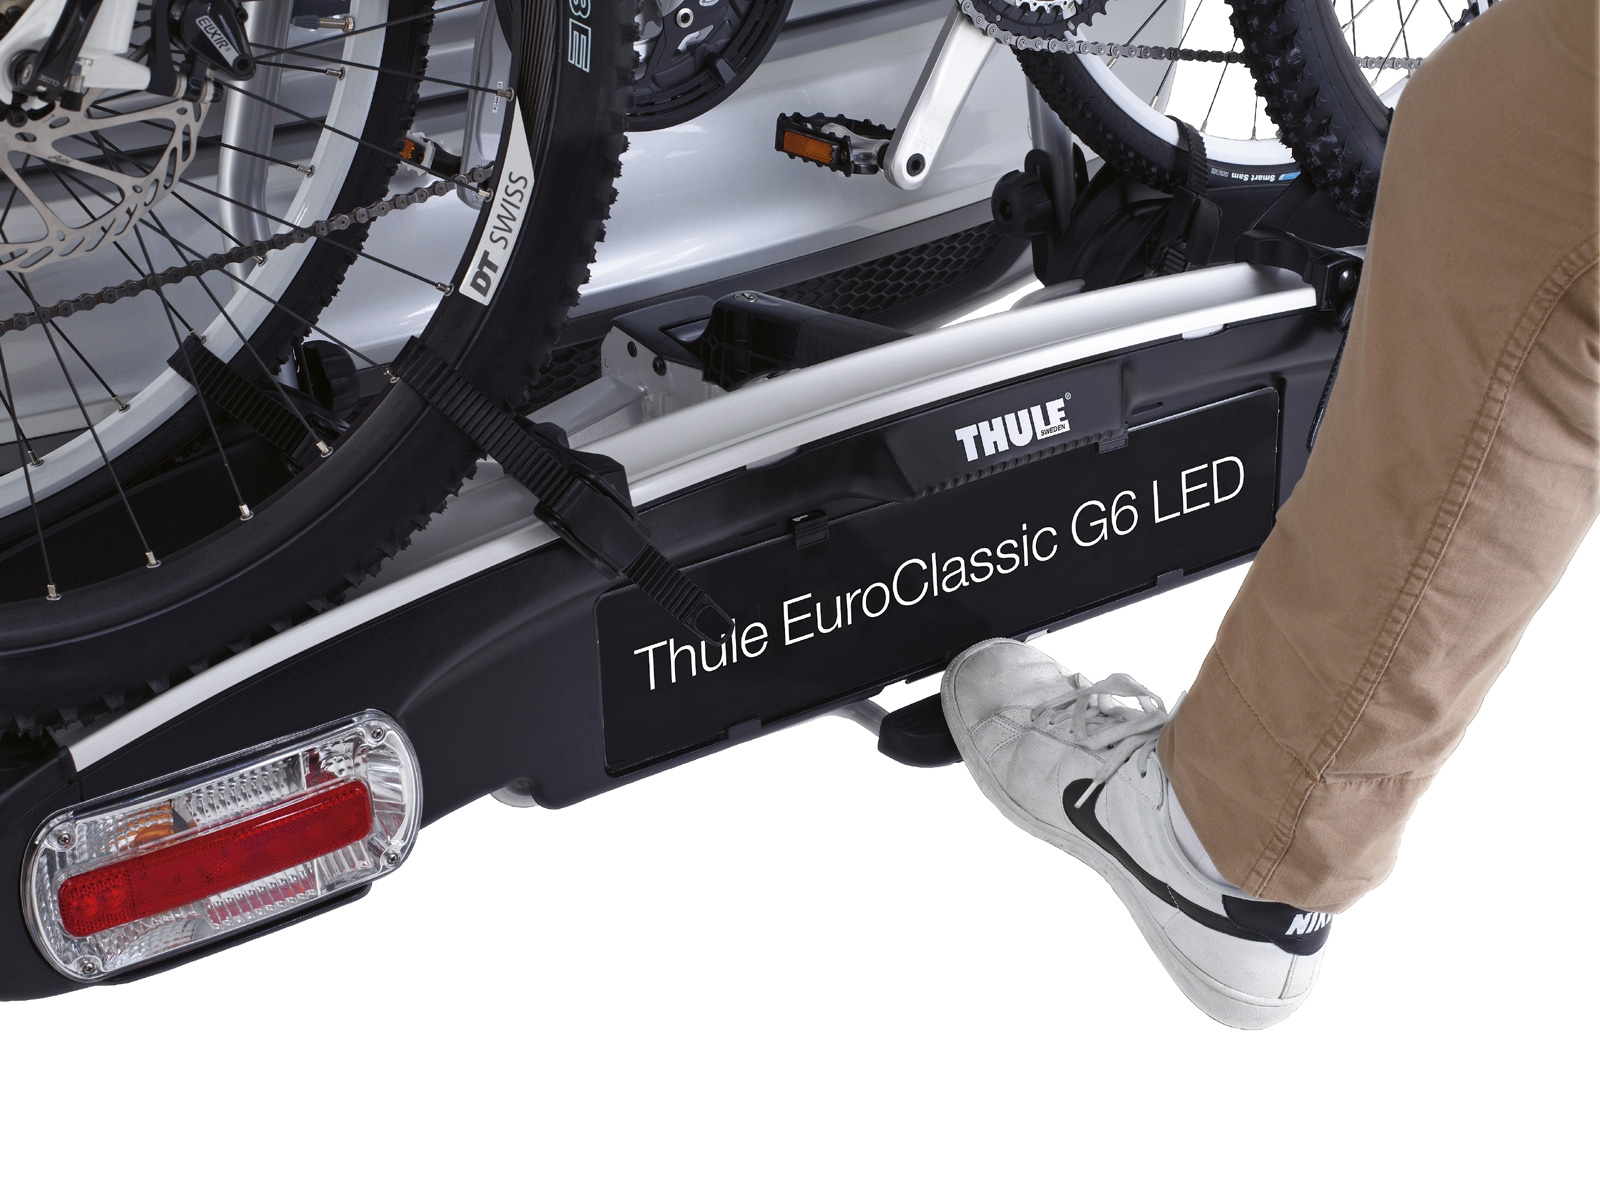 thule euroclassic g6 led 929 fietsendrager voor 3 fietsen. Black Bedroom Furniture Sets. Home Design Ideas